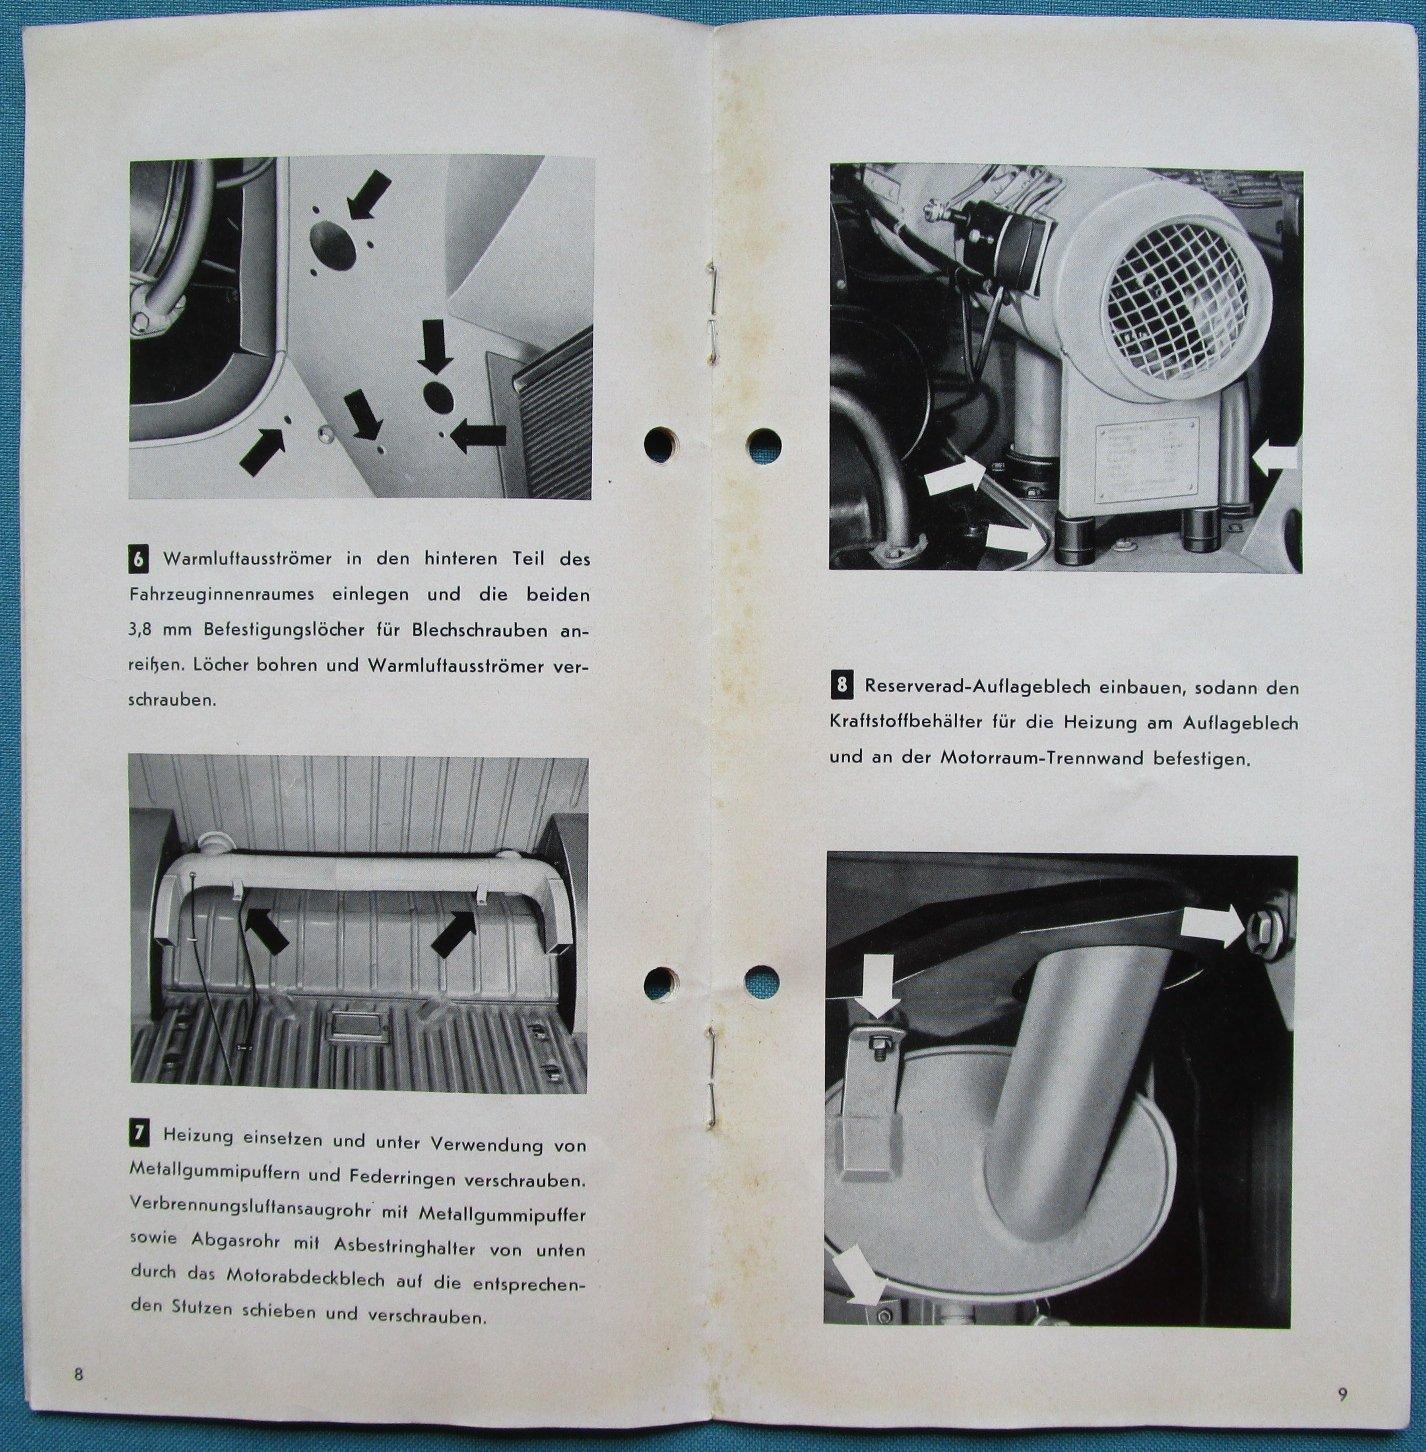 TheSamba com :: VW Archives - 1953 VW Barndoor Bus